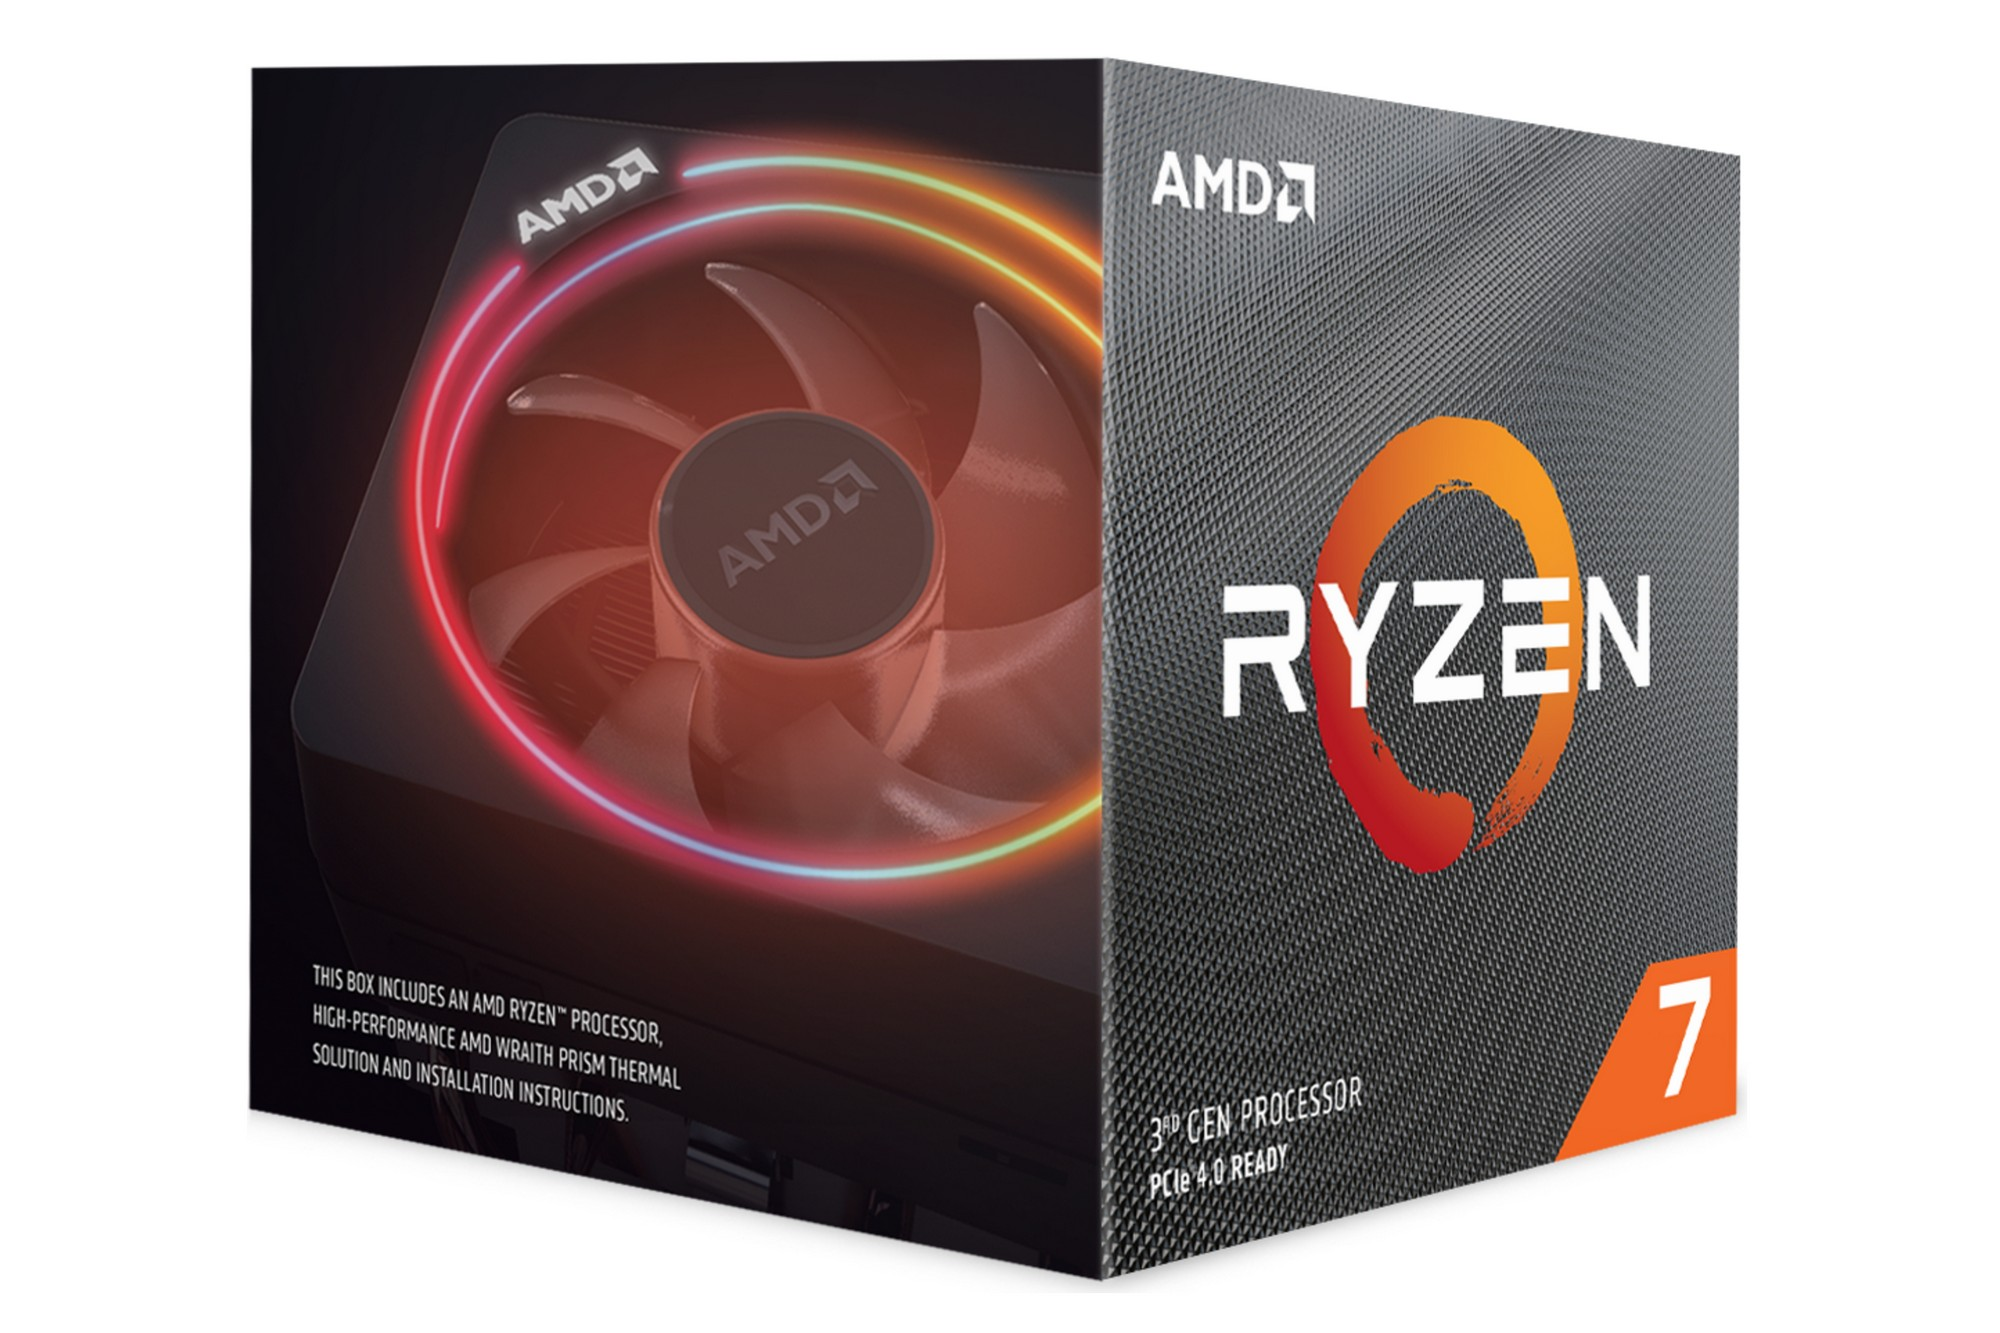 Ryzen 7 3700X box